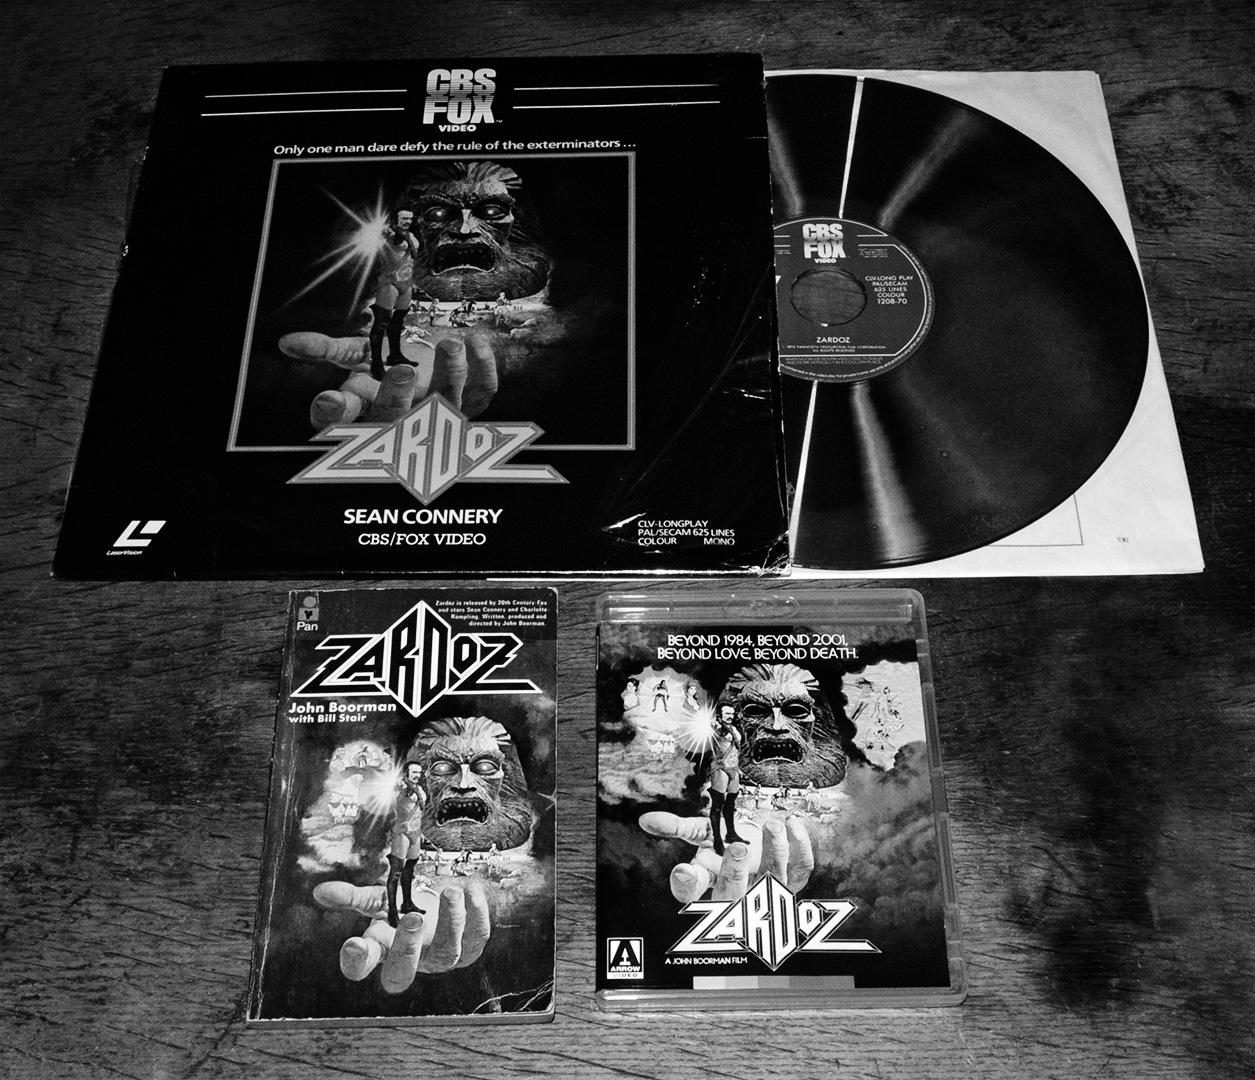 Zardoz-laser disc-novel-Arrow Bluray-A Year In The Country